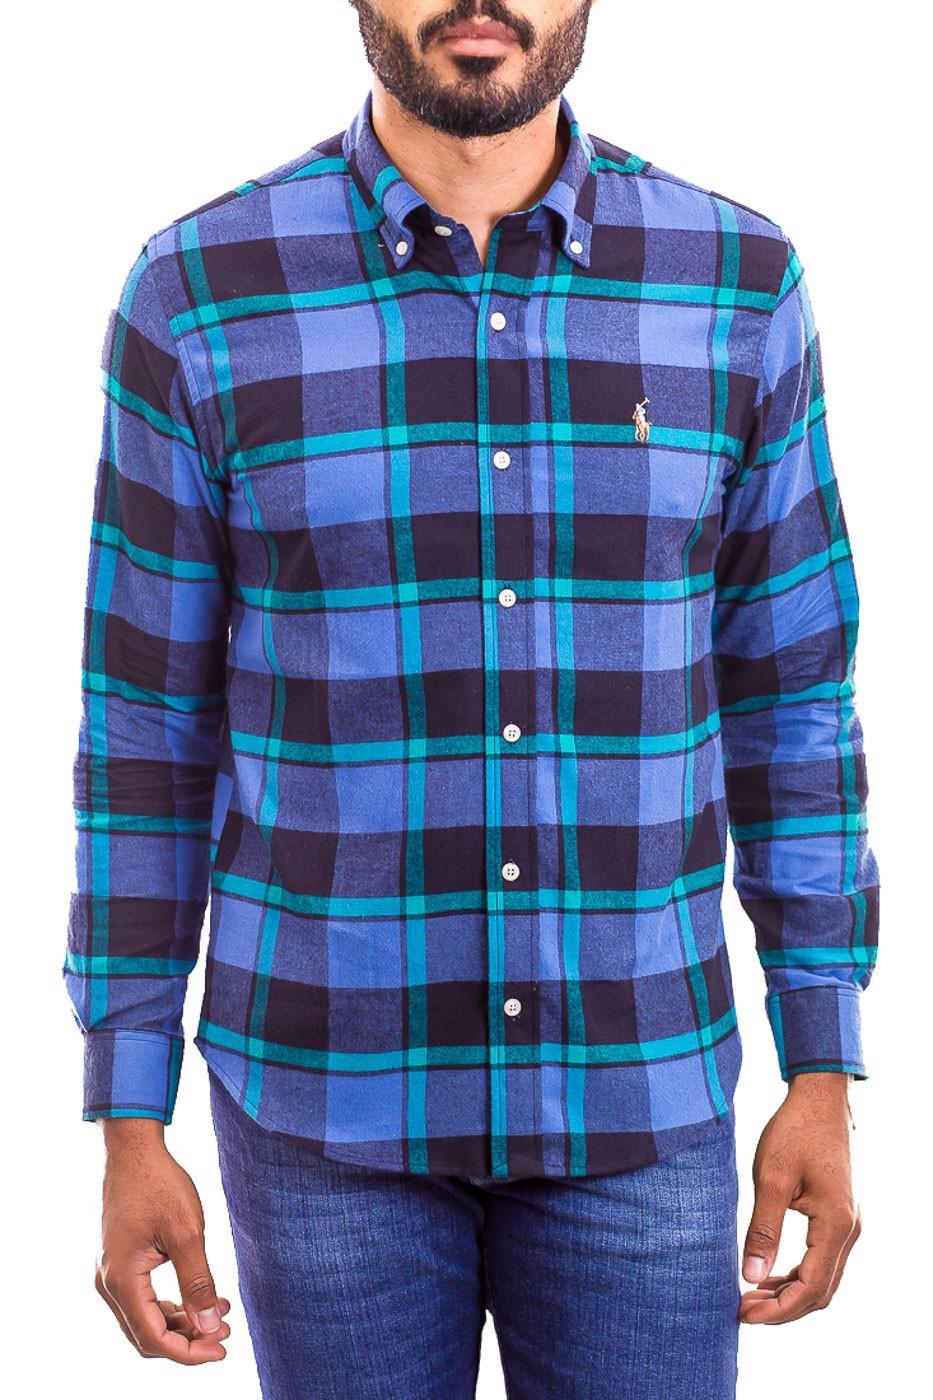 Camisa Ralph Lauren Masculina Custom Fit Xadrez Flanelada Logo Colored Azul